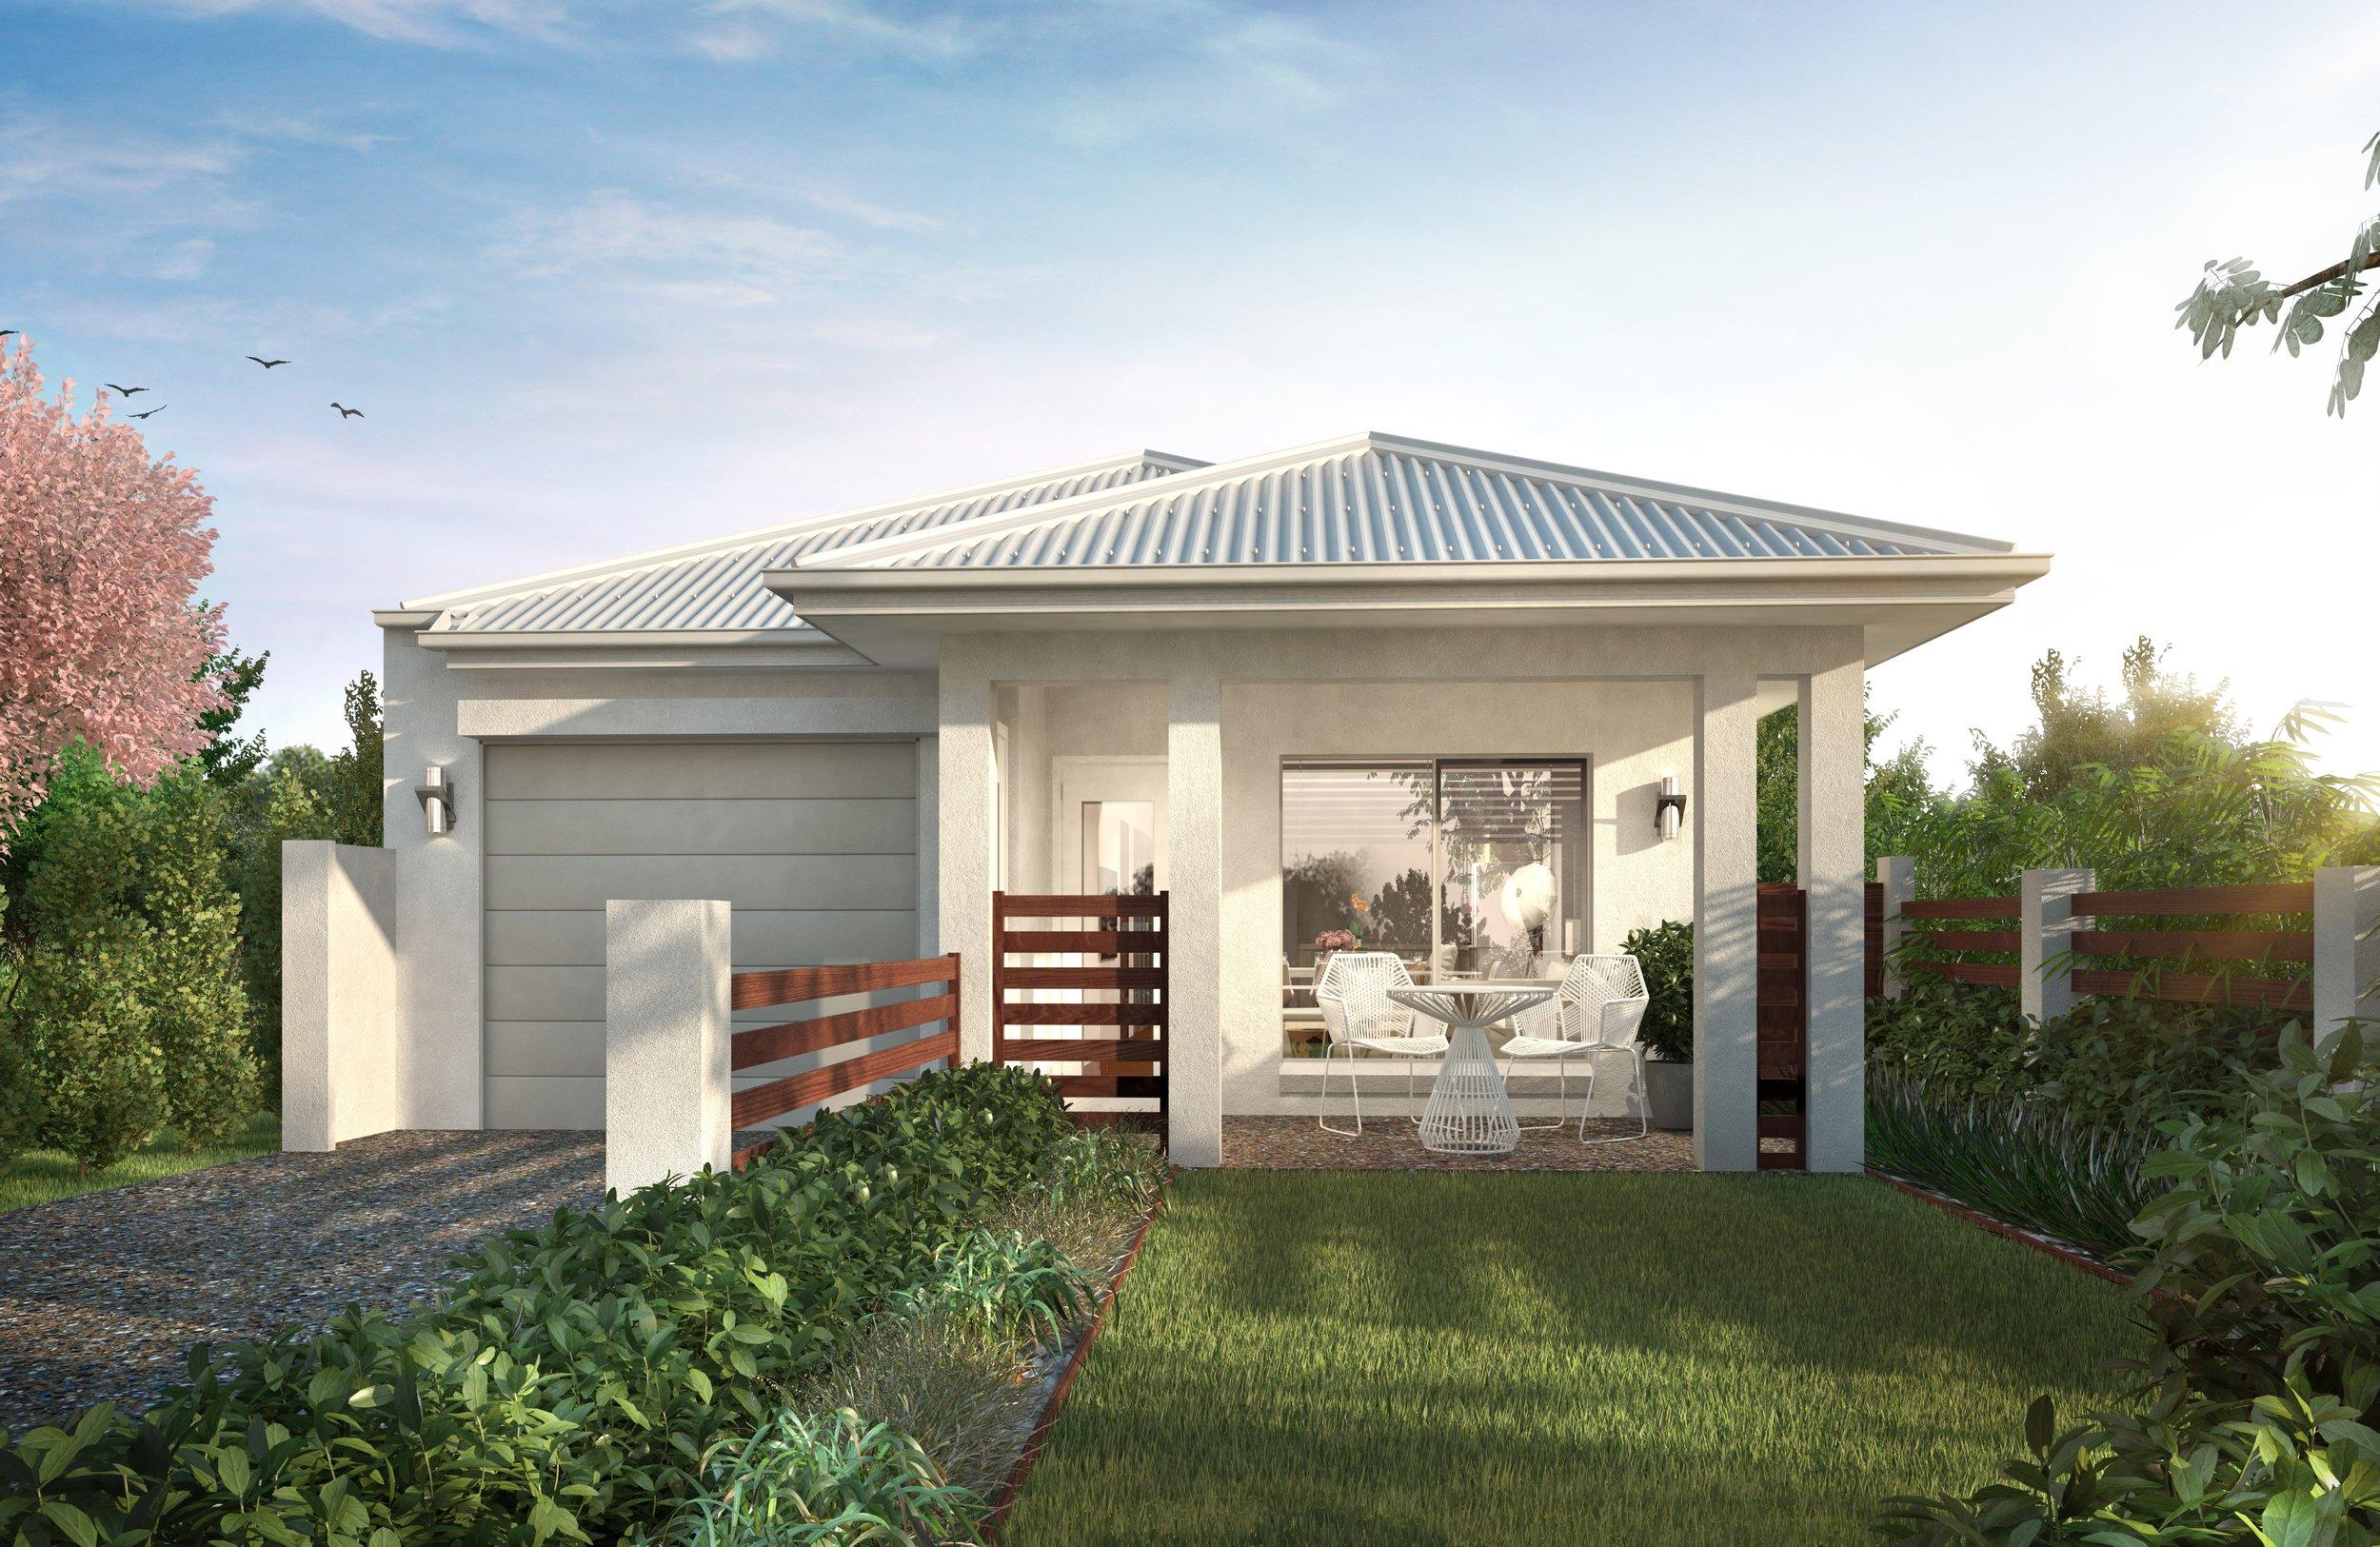 Lot 542 Vale     H & L $359,500 - 3 BED 2 BATH 1 CAR- 2700mm high ceilings- 'Smart Villa' Inclusions- Steel frame